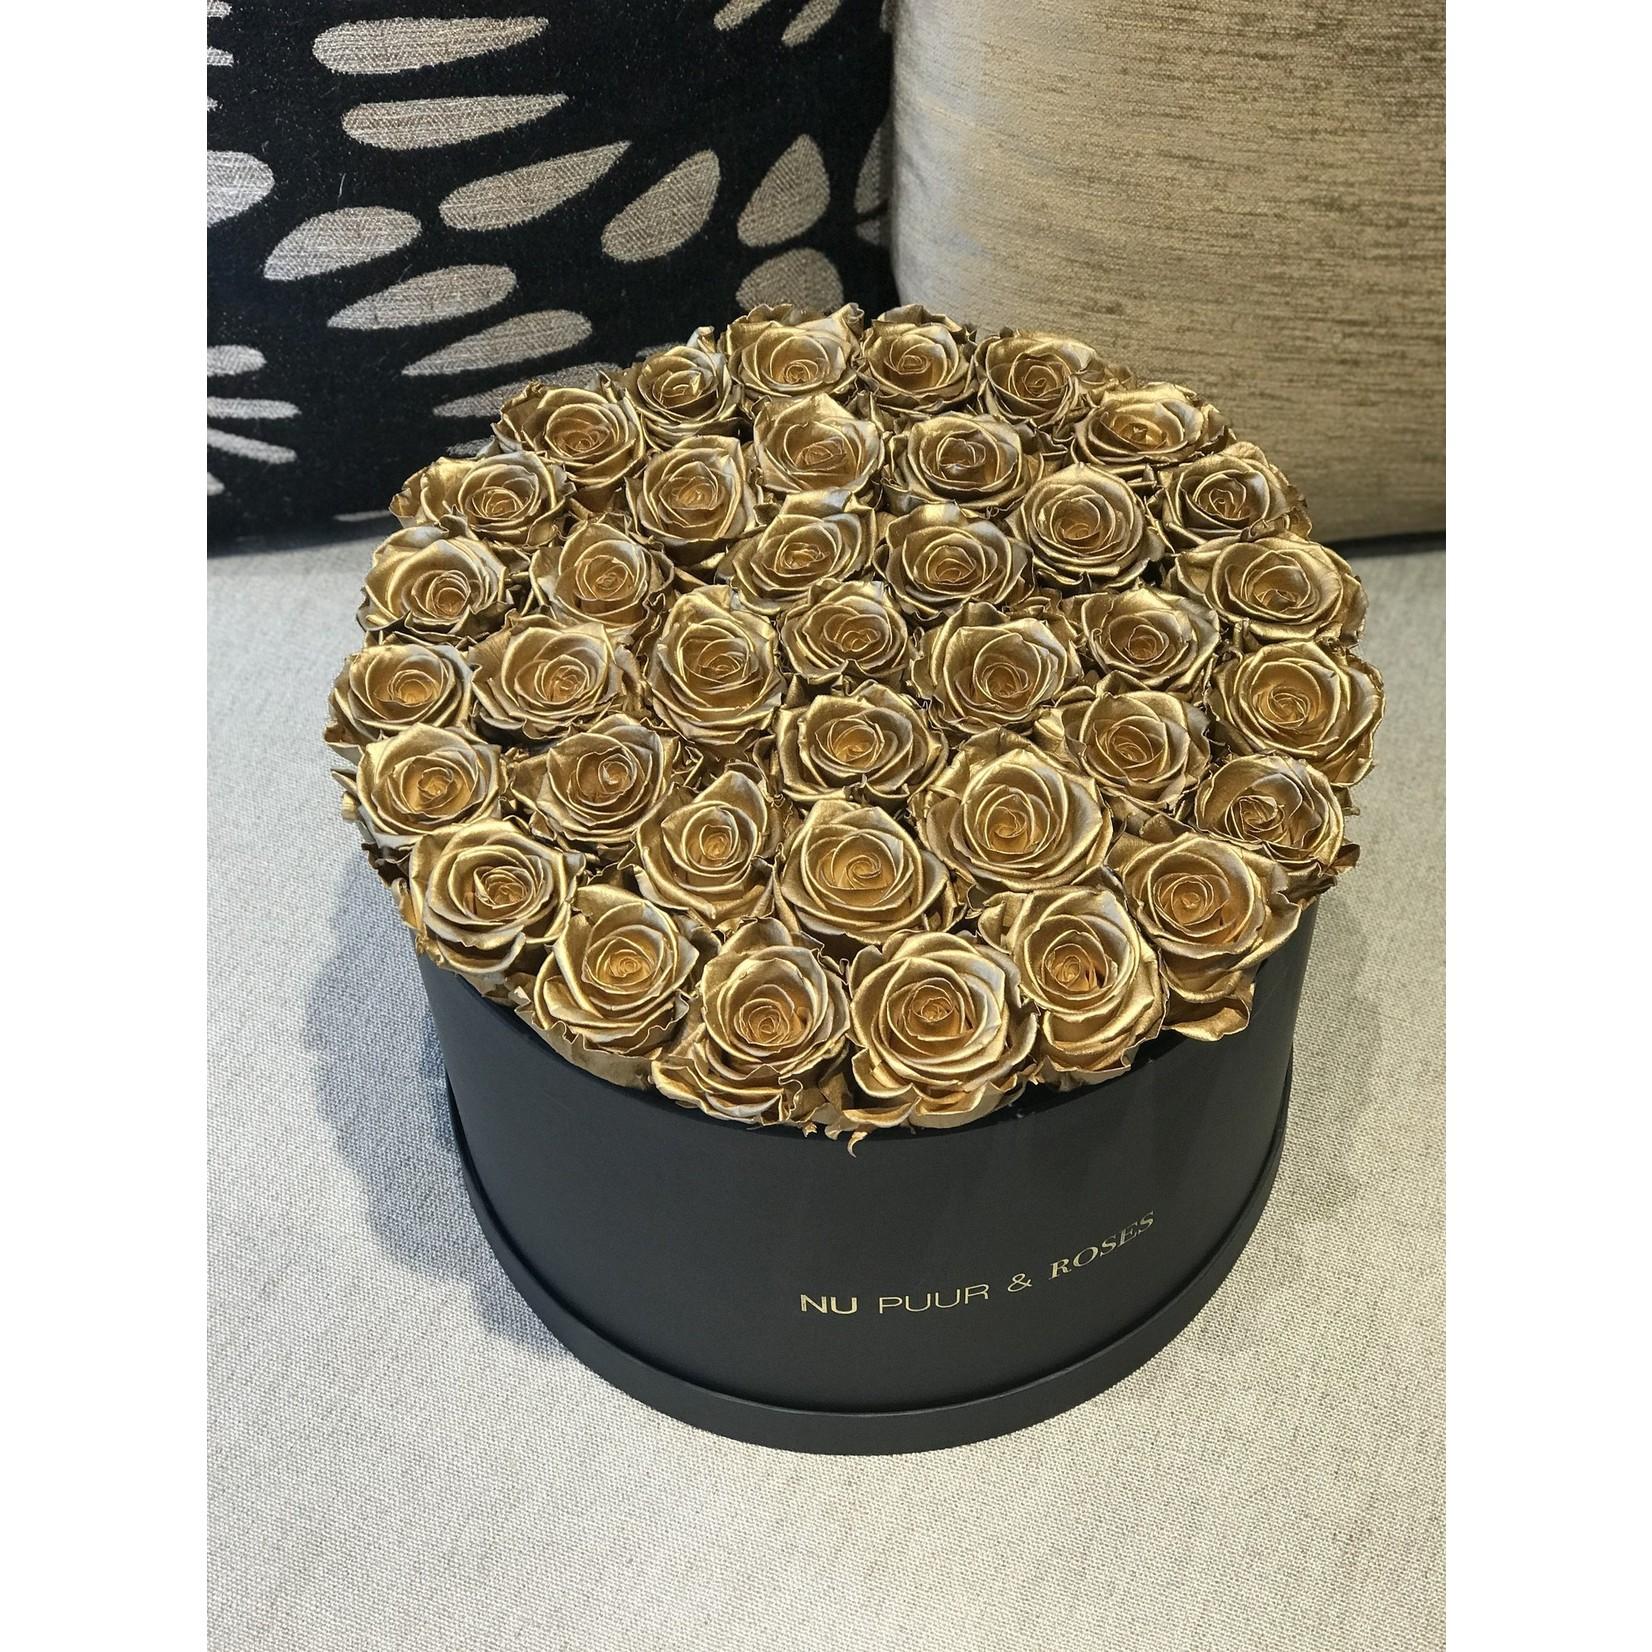 Extra Large - Gold Endless Roses - Black Box